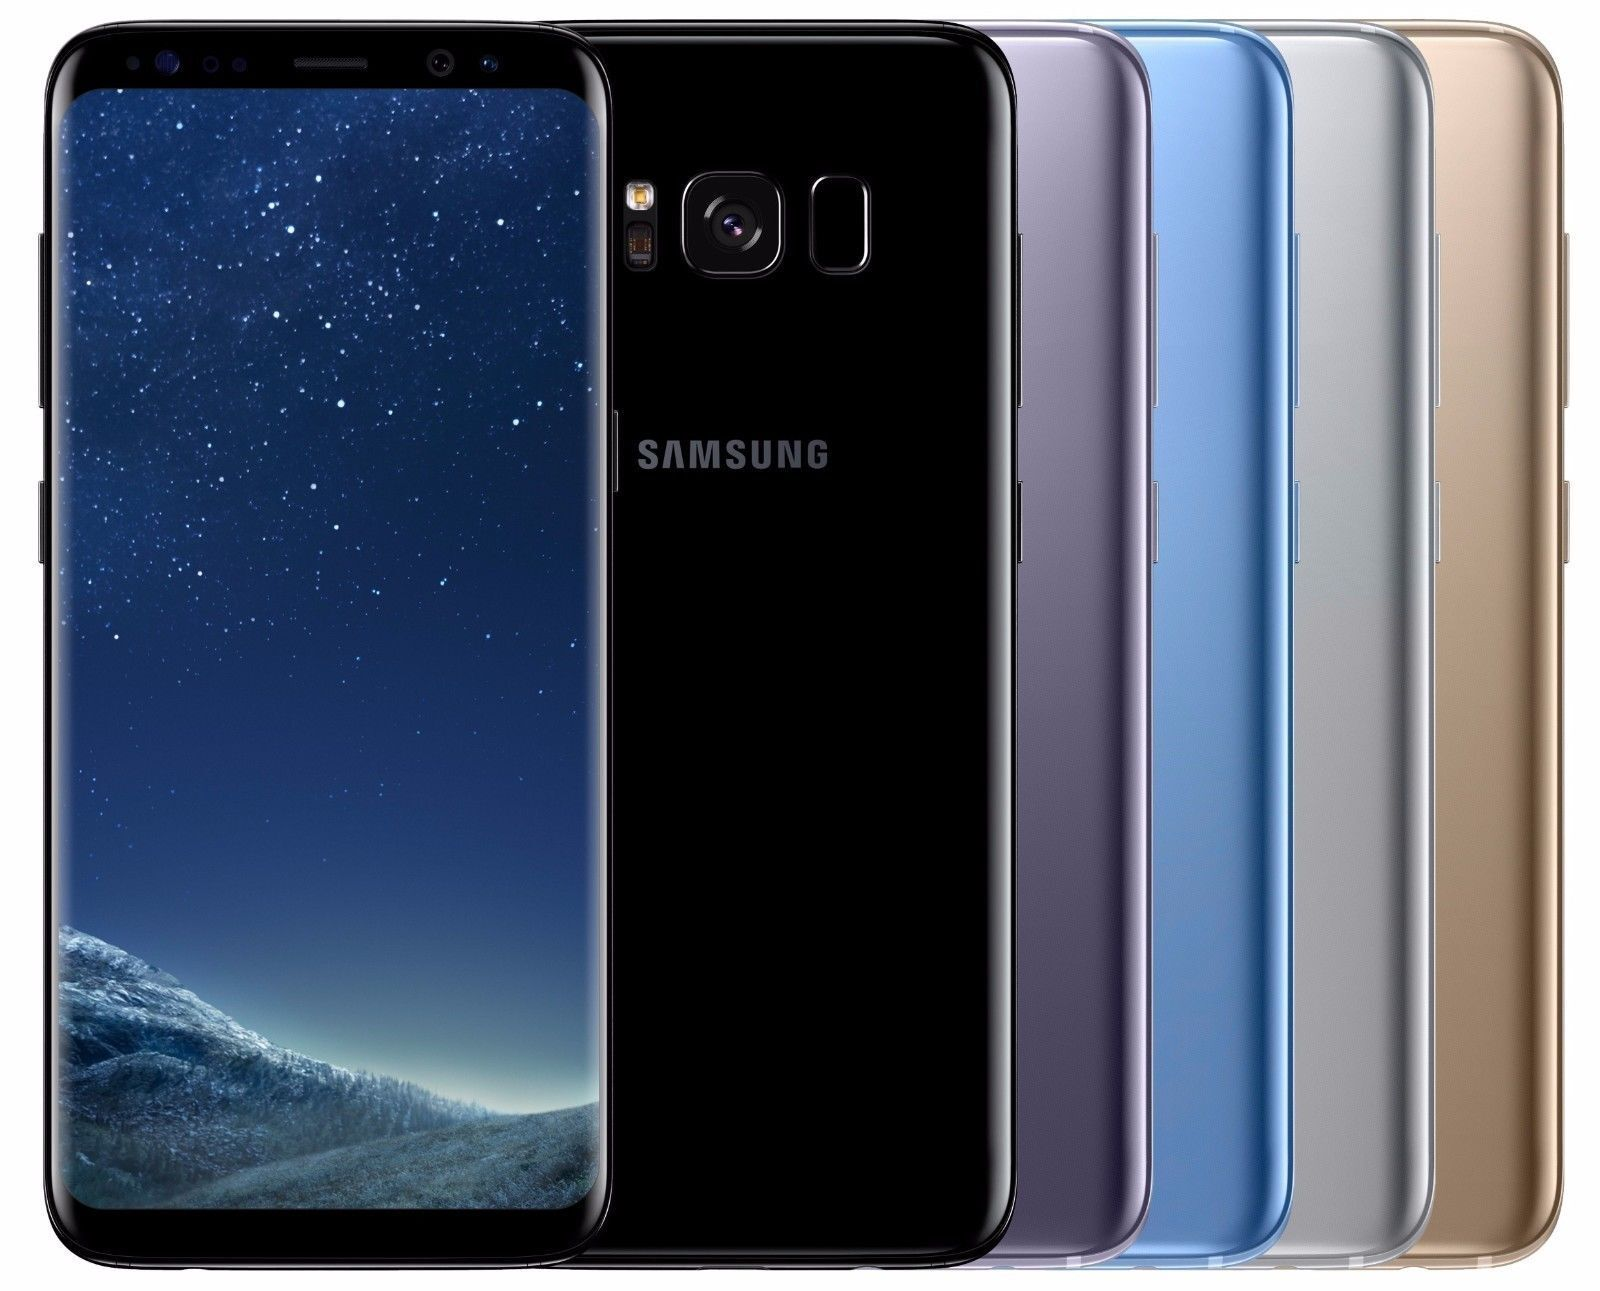 Samsung Galaxy S8 SM-G950FD Dual SIM FACTORY UNLOCKED Black Gold Gray